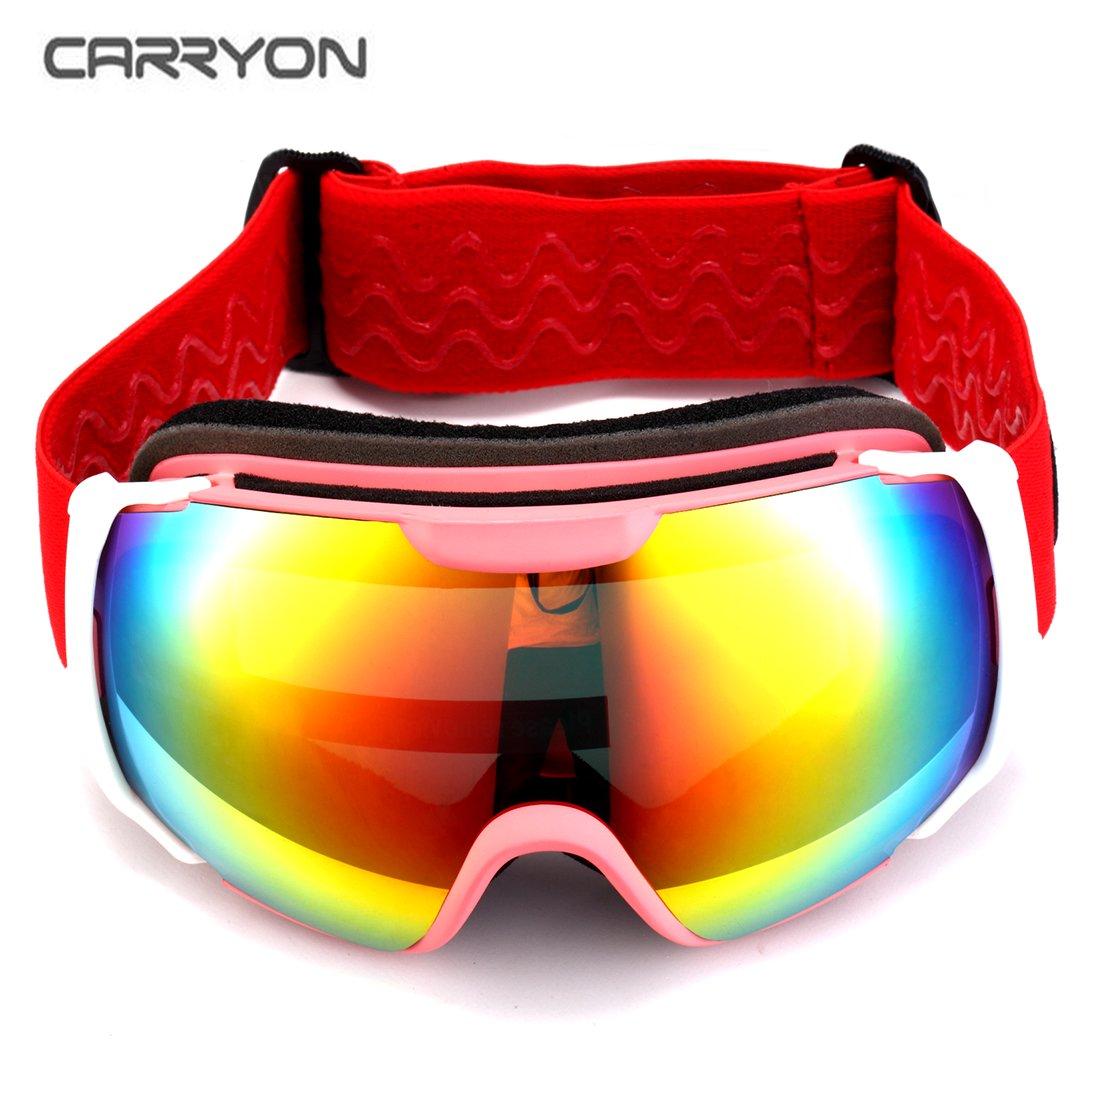 de6fcbec1a9d Carryon Authorized Adult Snowboard Goggles Ski Glasses Spherical Anti-fog  Golden